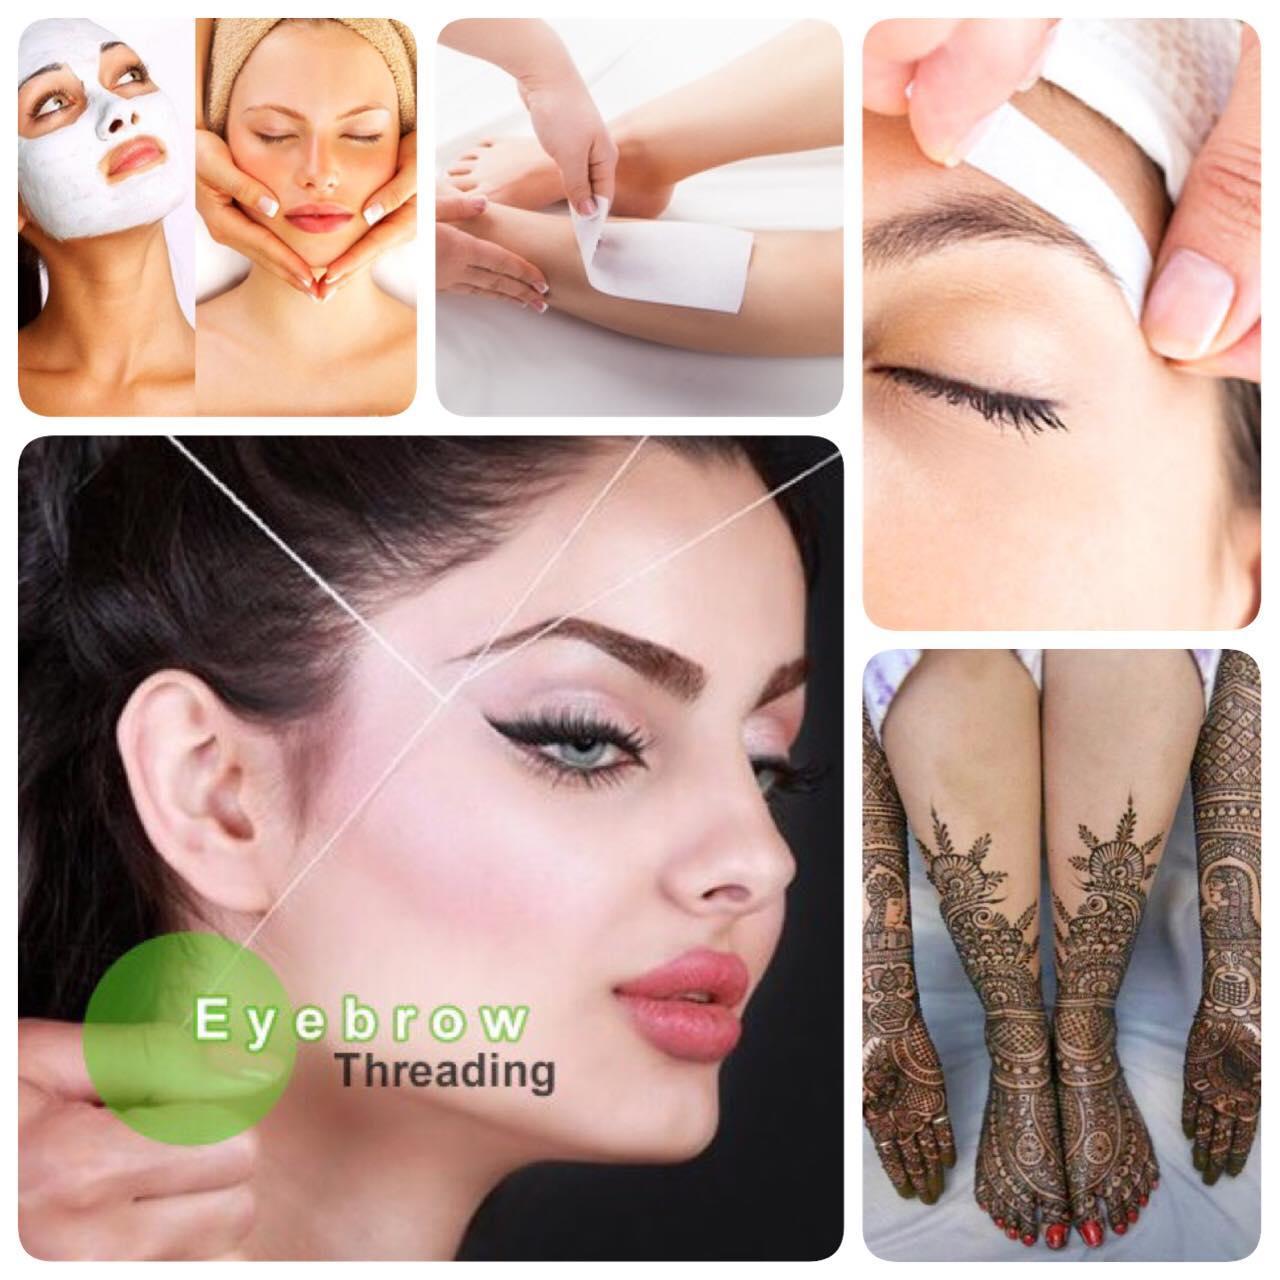 Eyebrow Threading Salon.